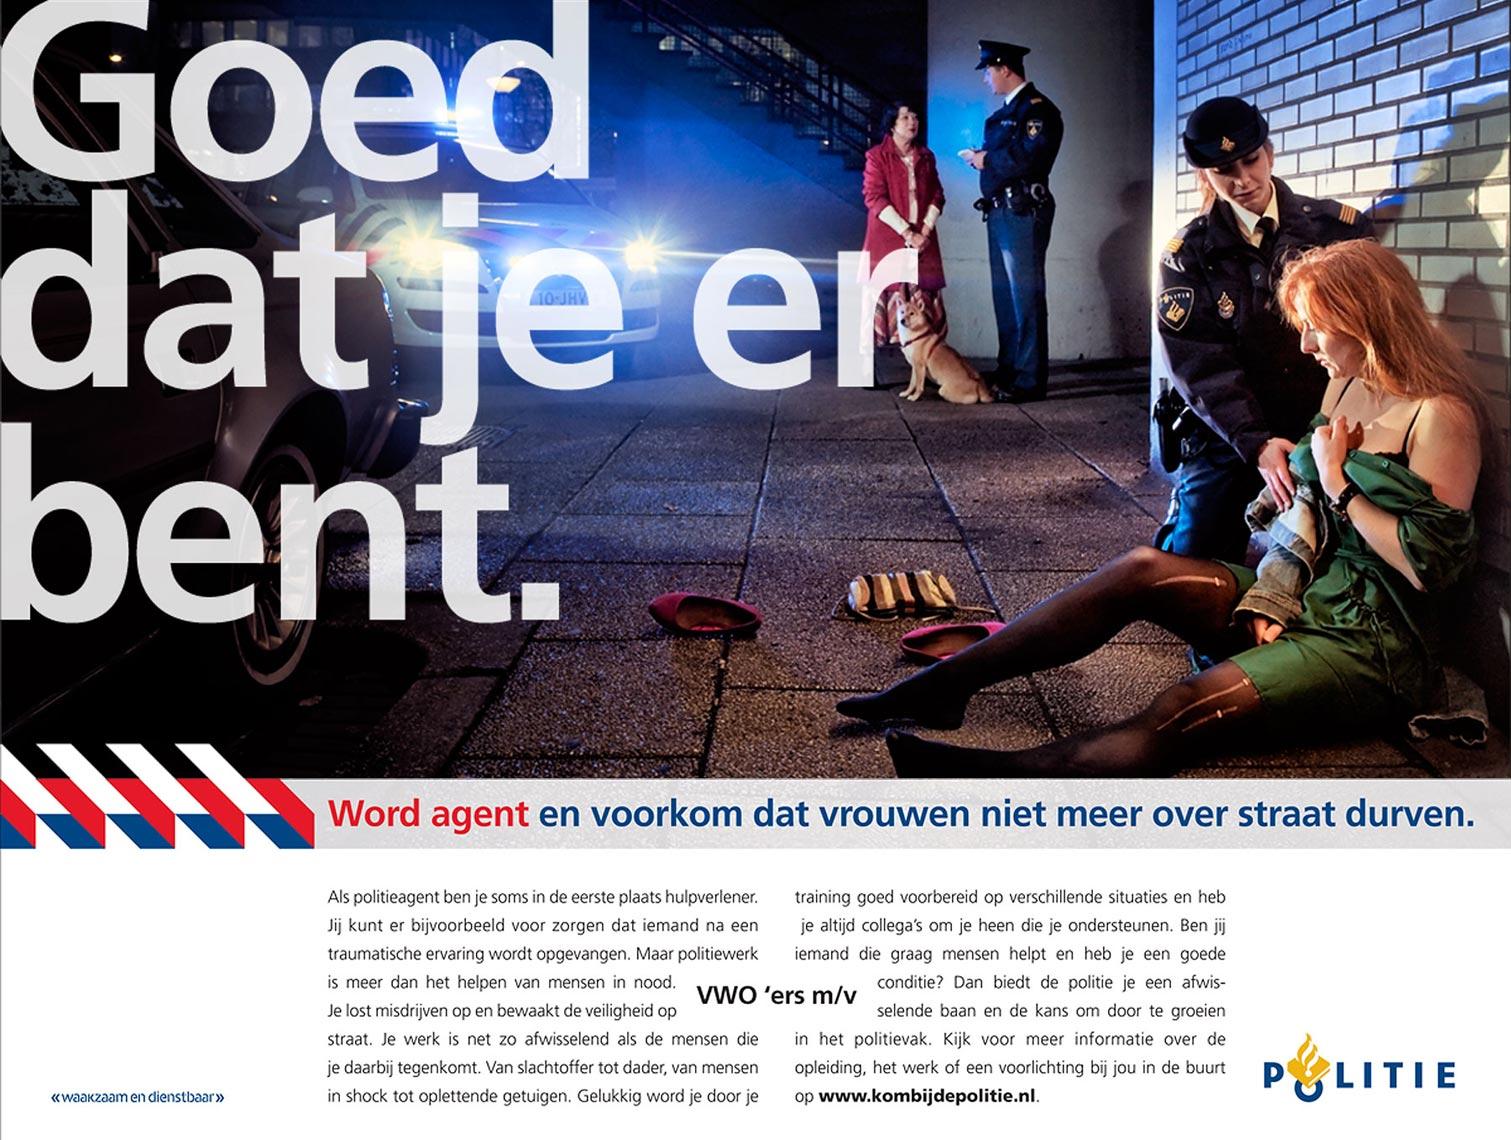 maximum-politie-reclamefotografie-pim-vuik-fotografie-rotterdam-04.jpg